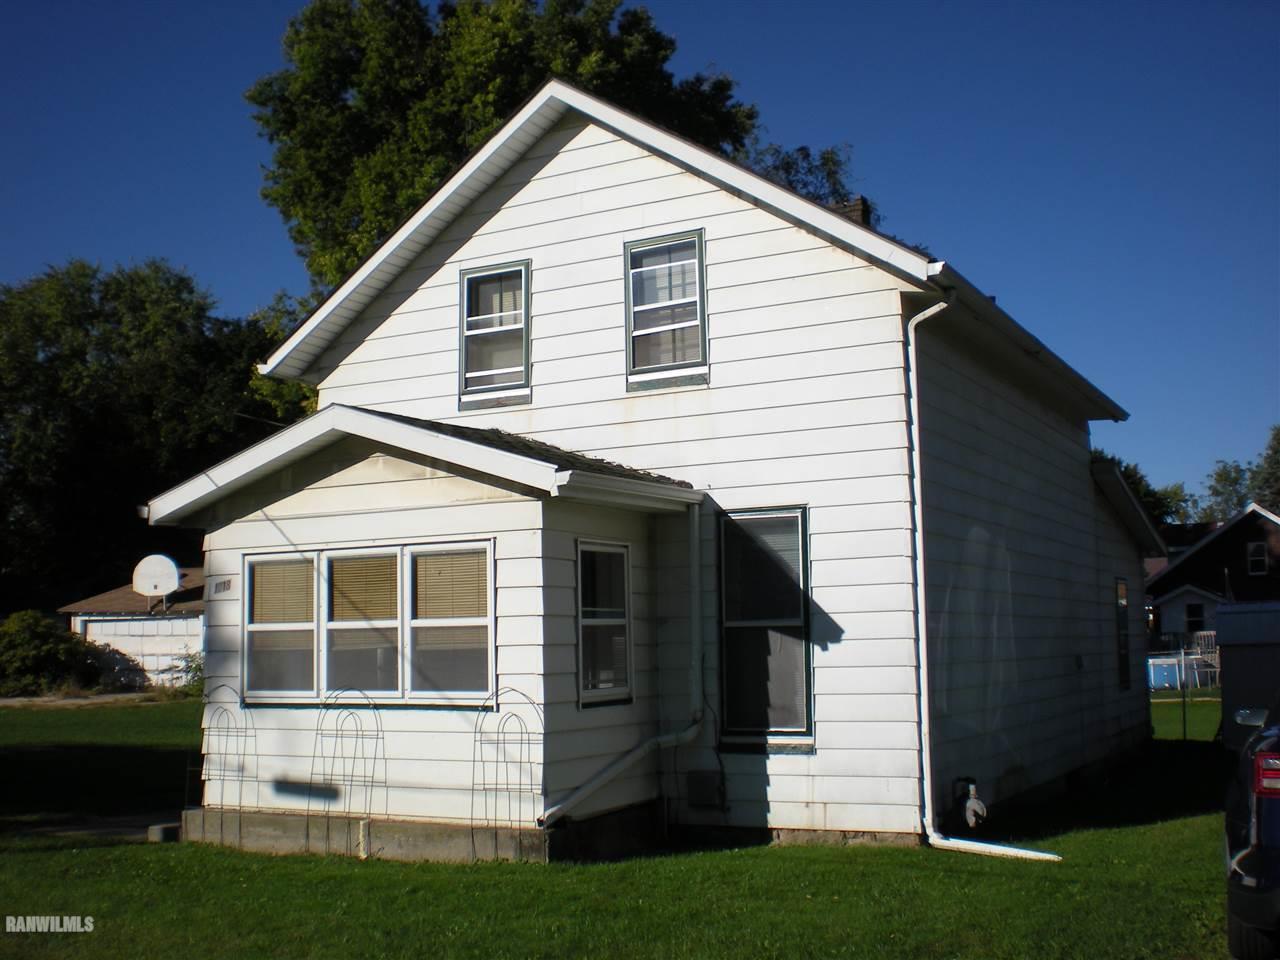 Real Estate for Sale, ListingId: 35641785, Freeport,IL61032